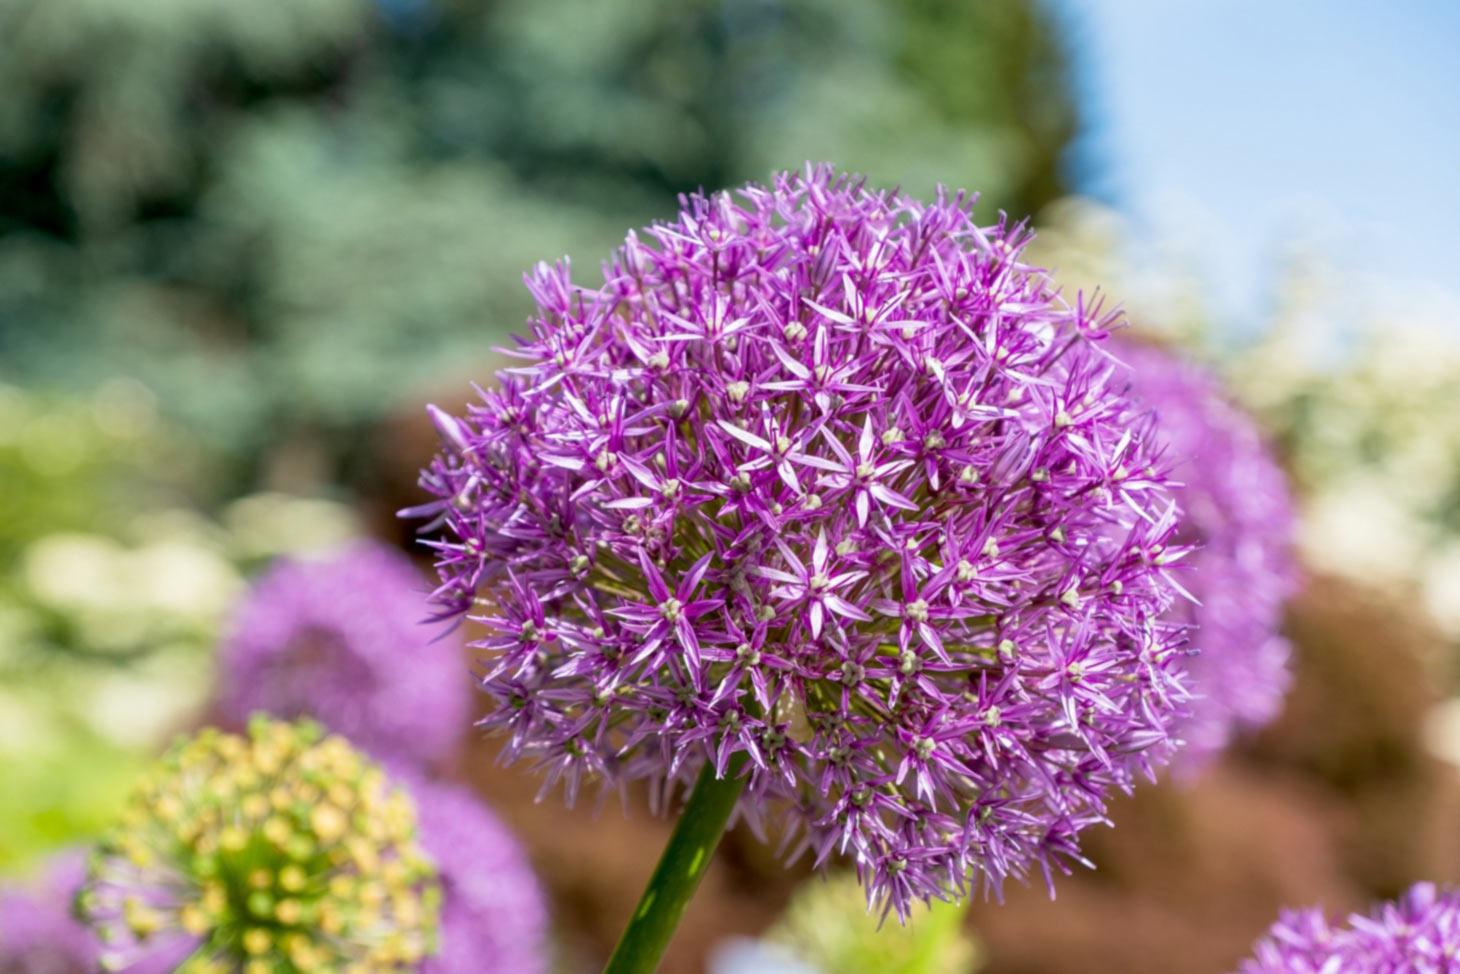 Kugelförmige Blüte Zierlauch